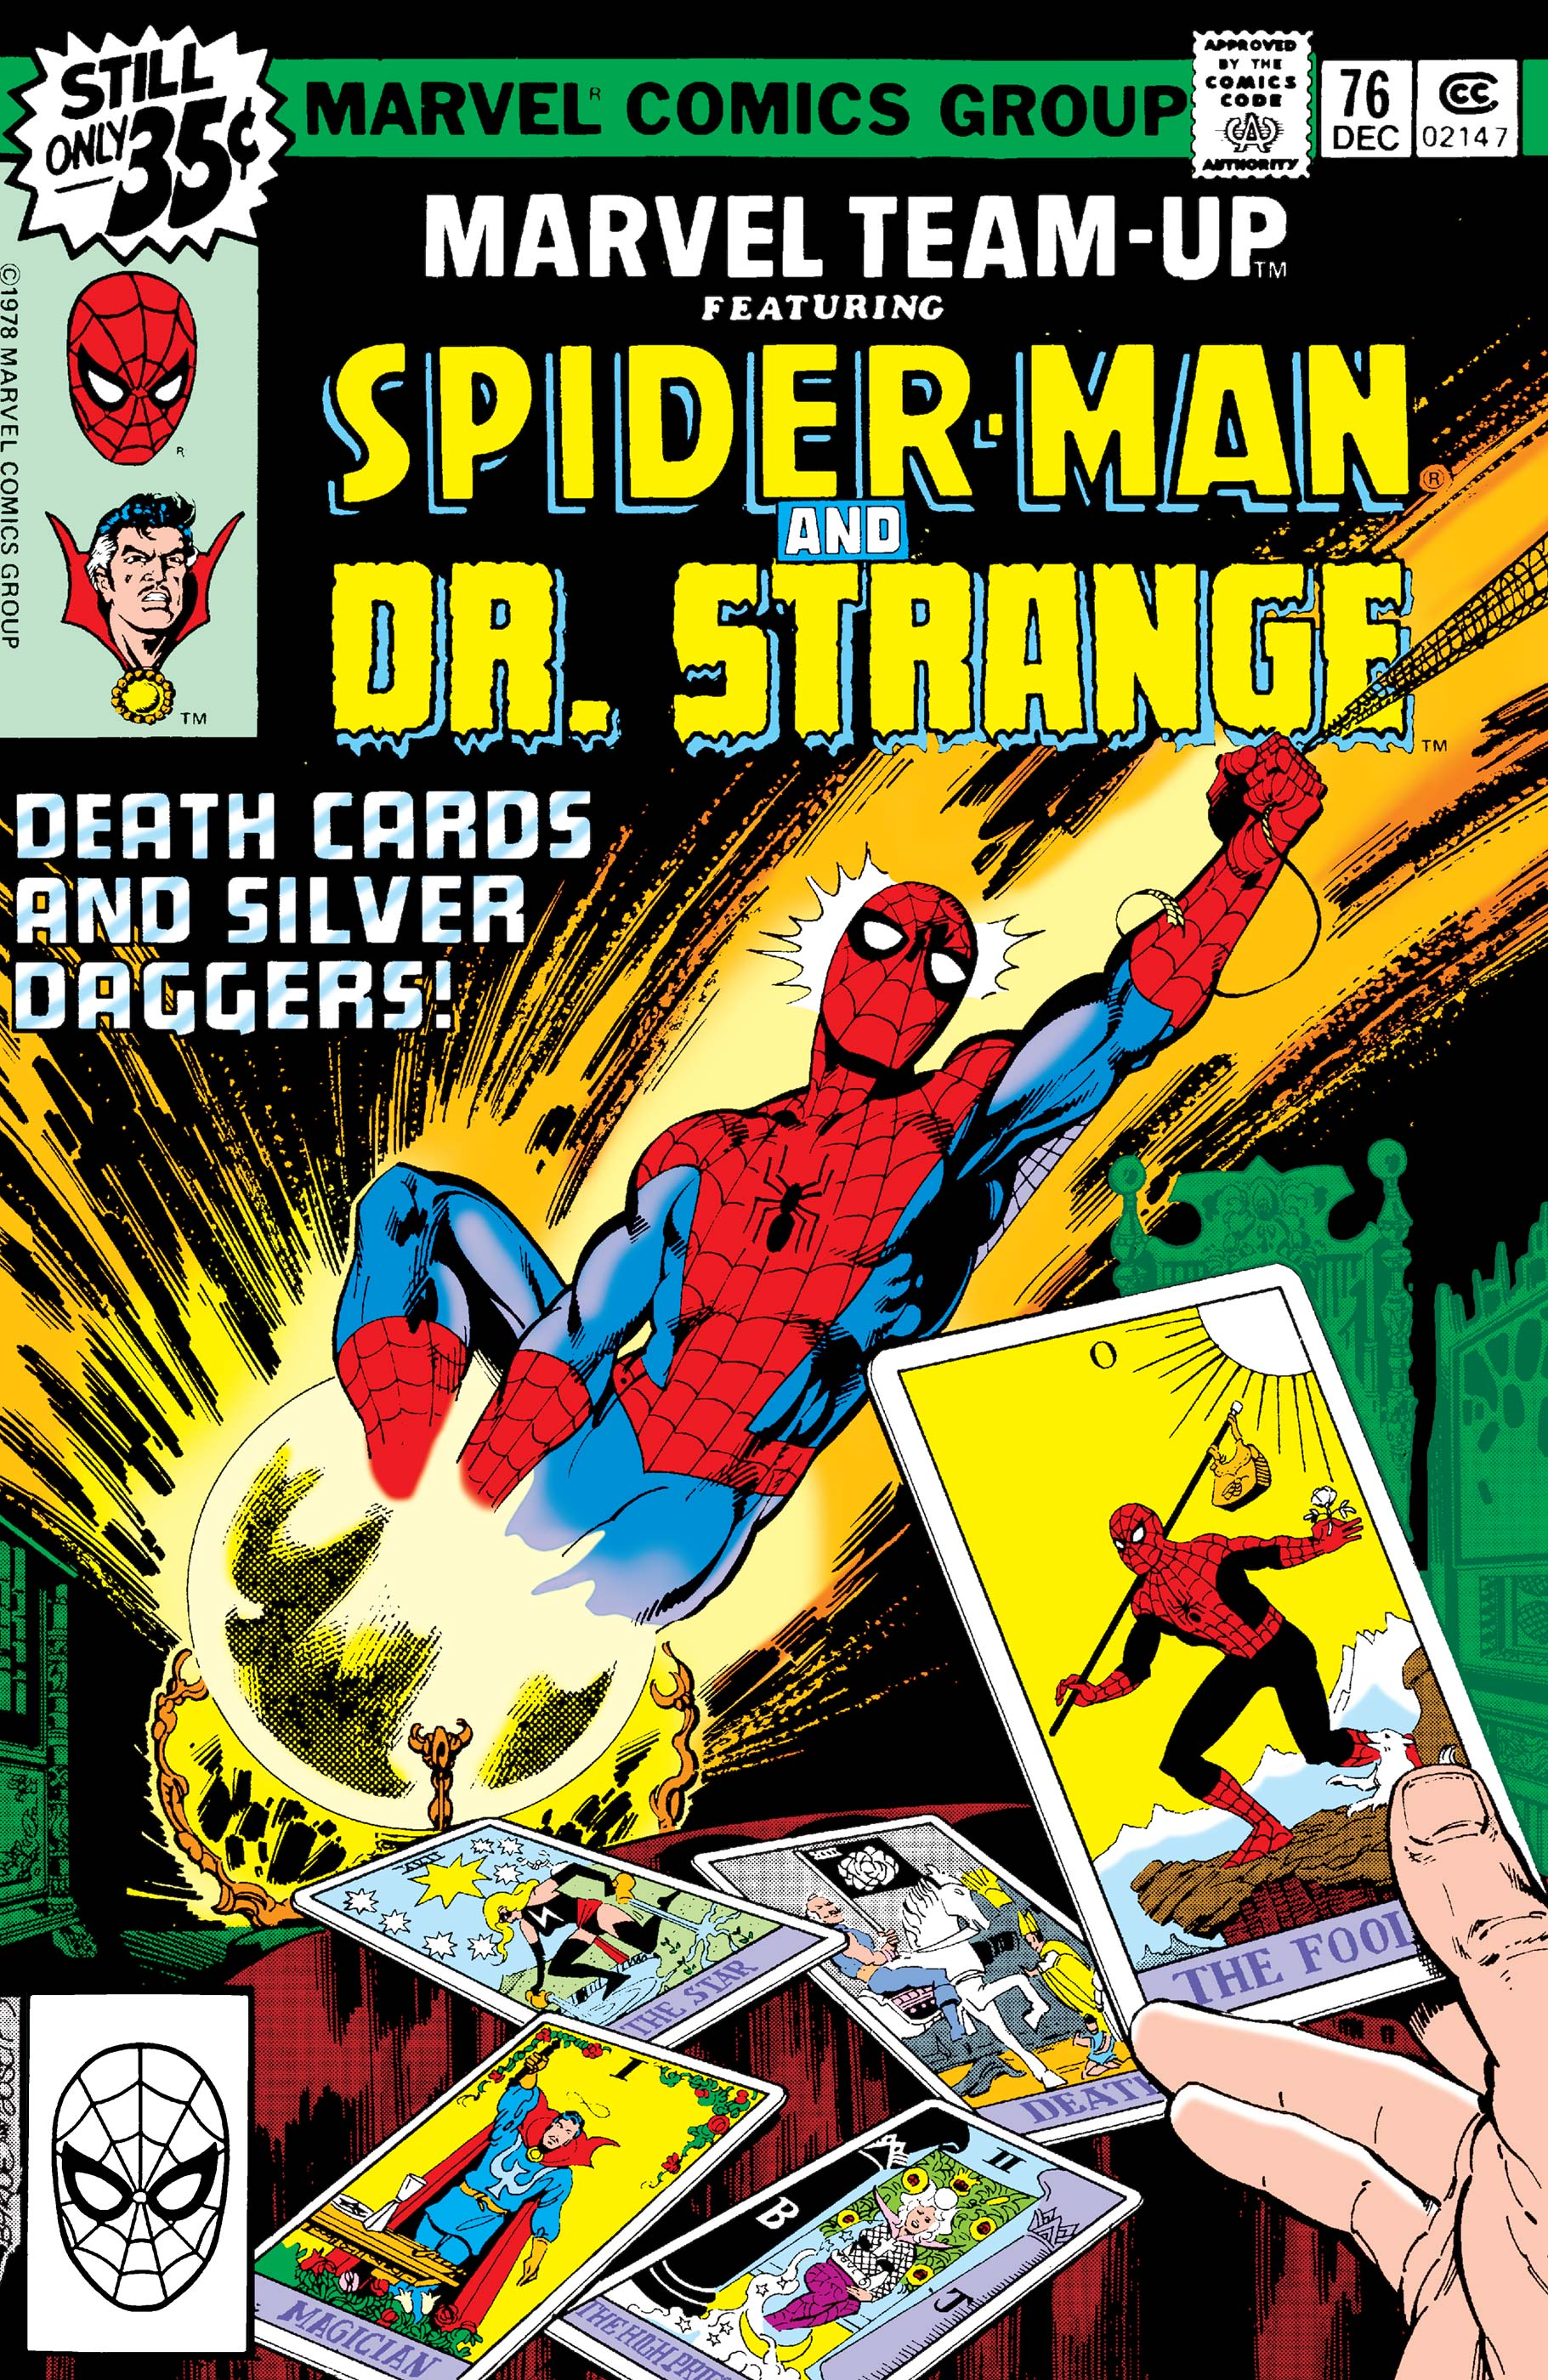 Marvel Team-Up (1972) #76